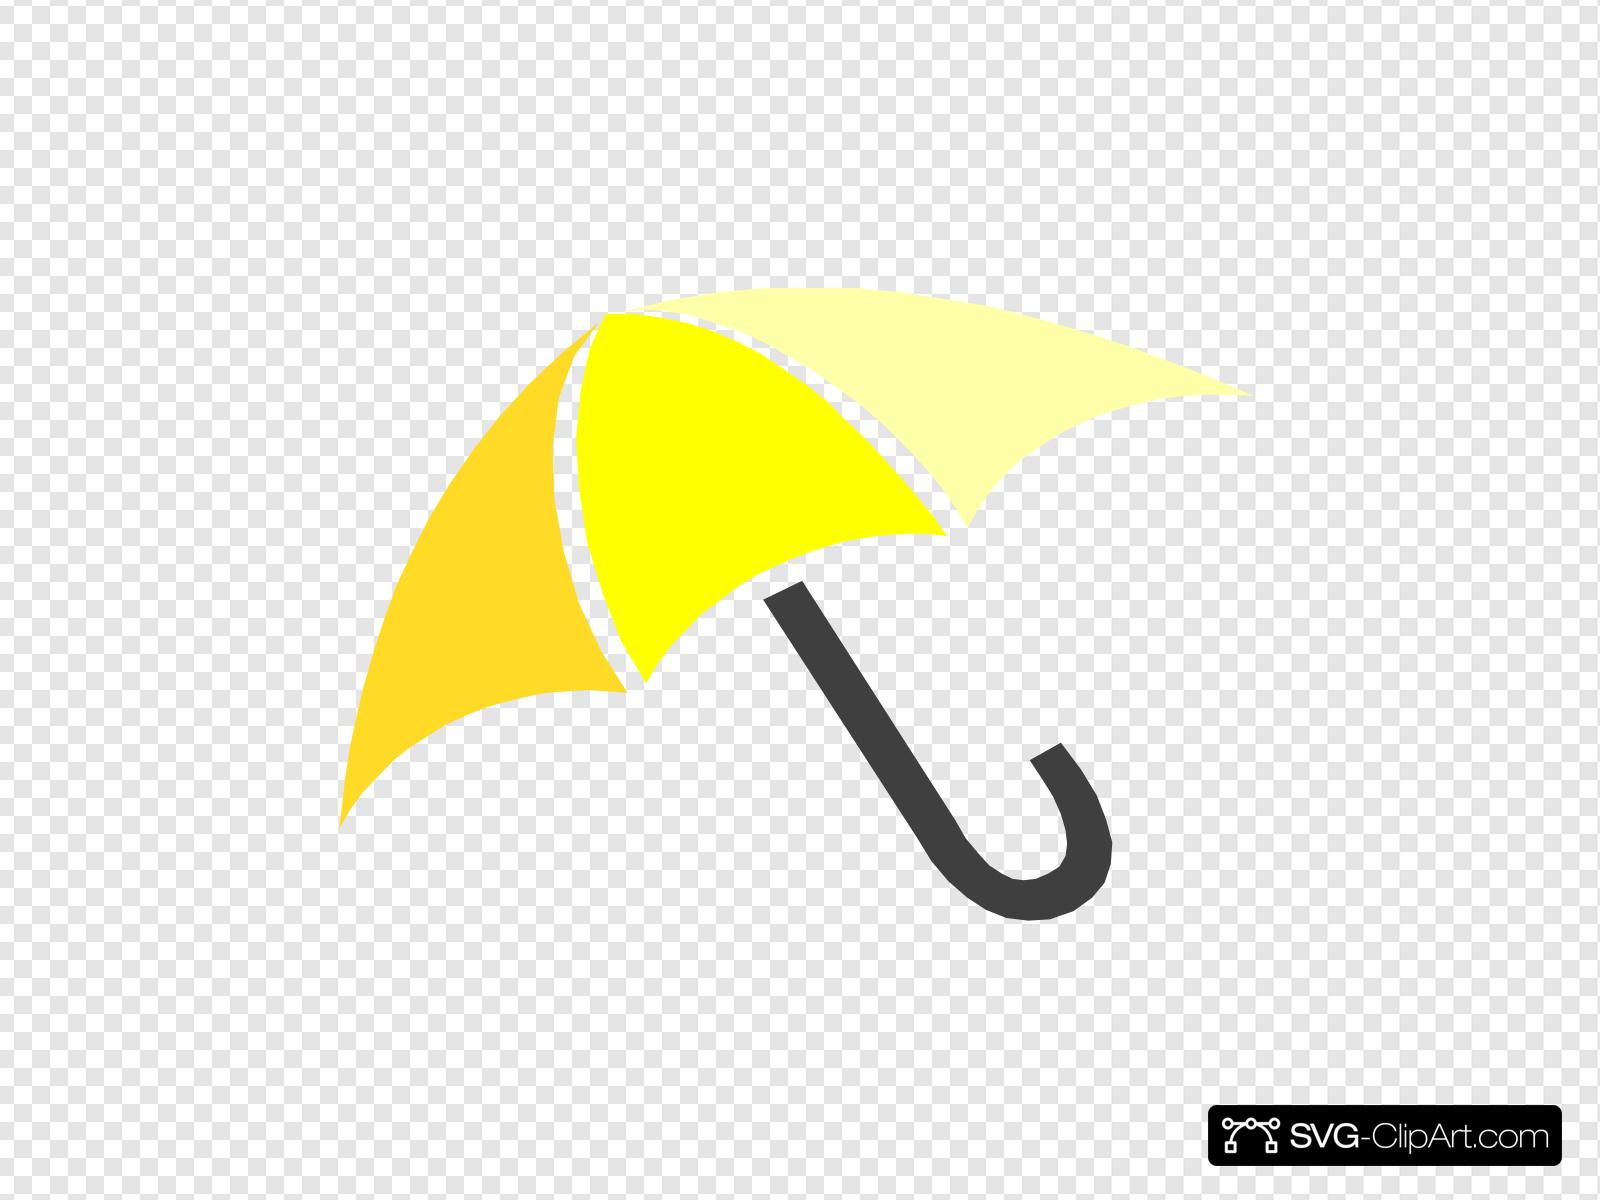 Yellow umbrella clipart picture freeuse library Yellow Umbrella Clip art, Icon and SVG - SVG Clipart picture freeuse library